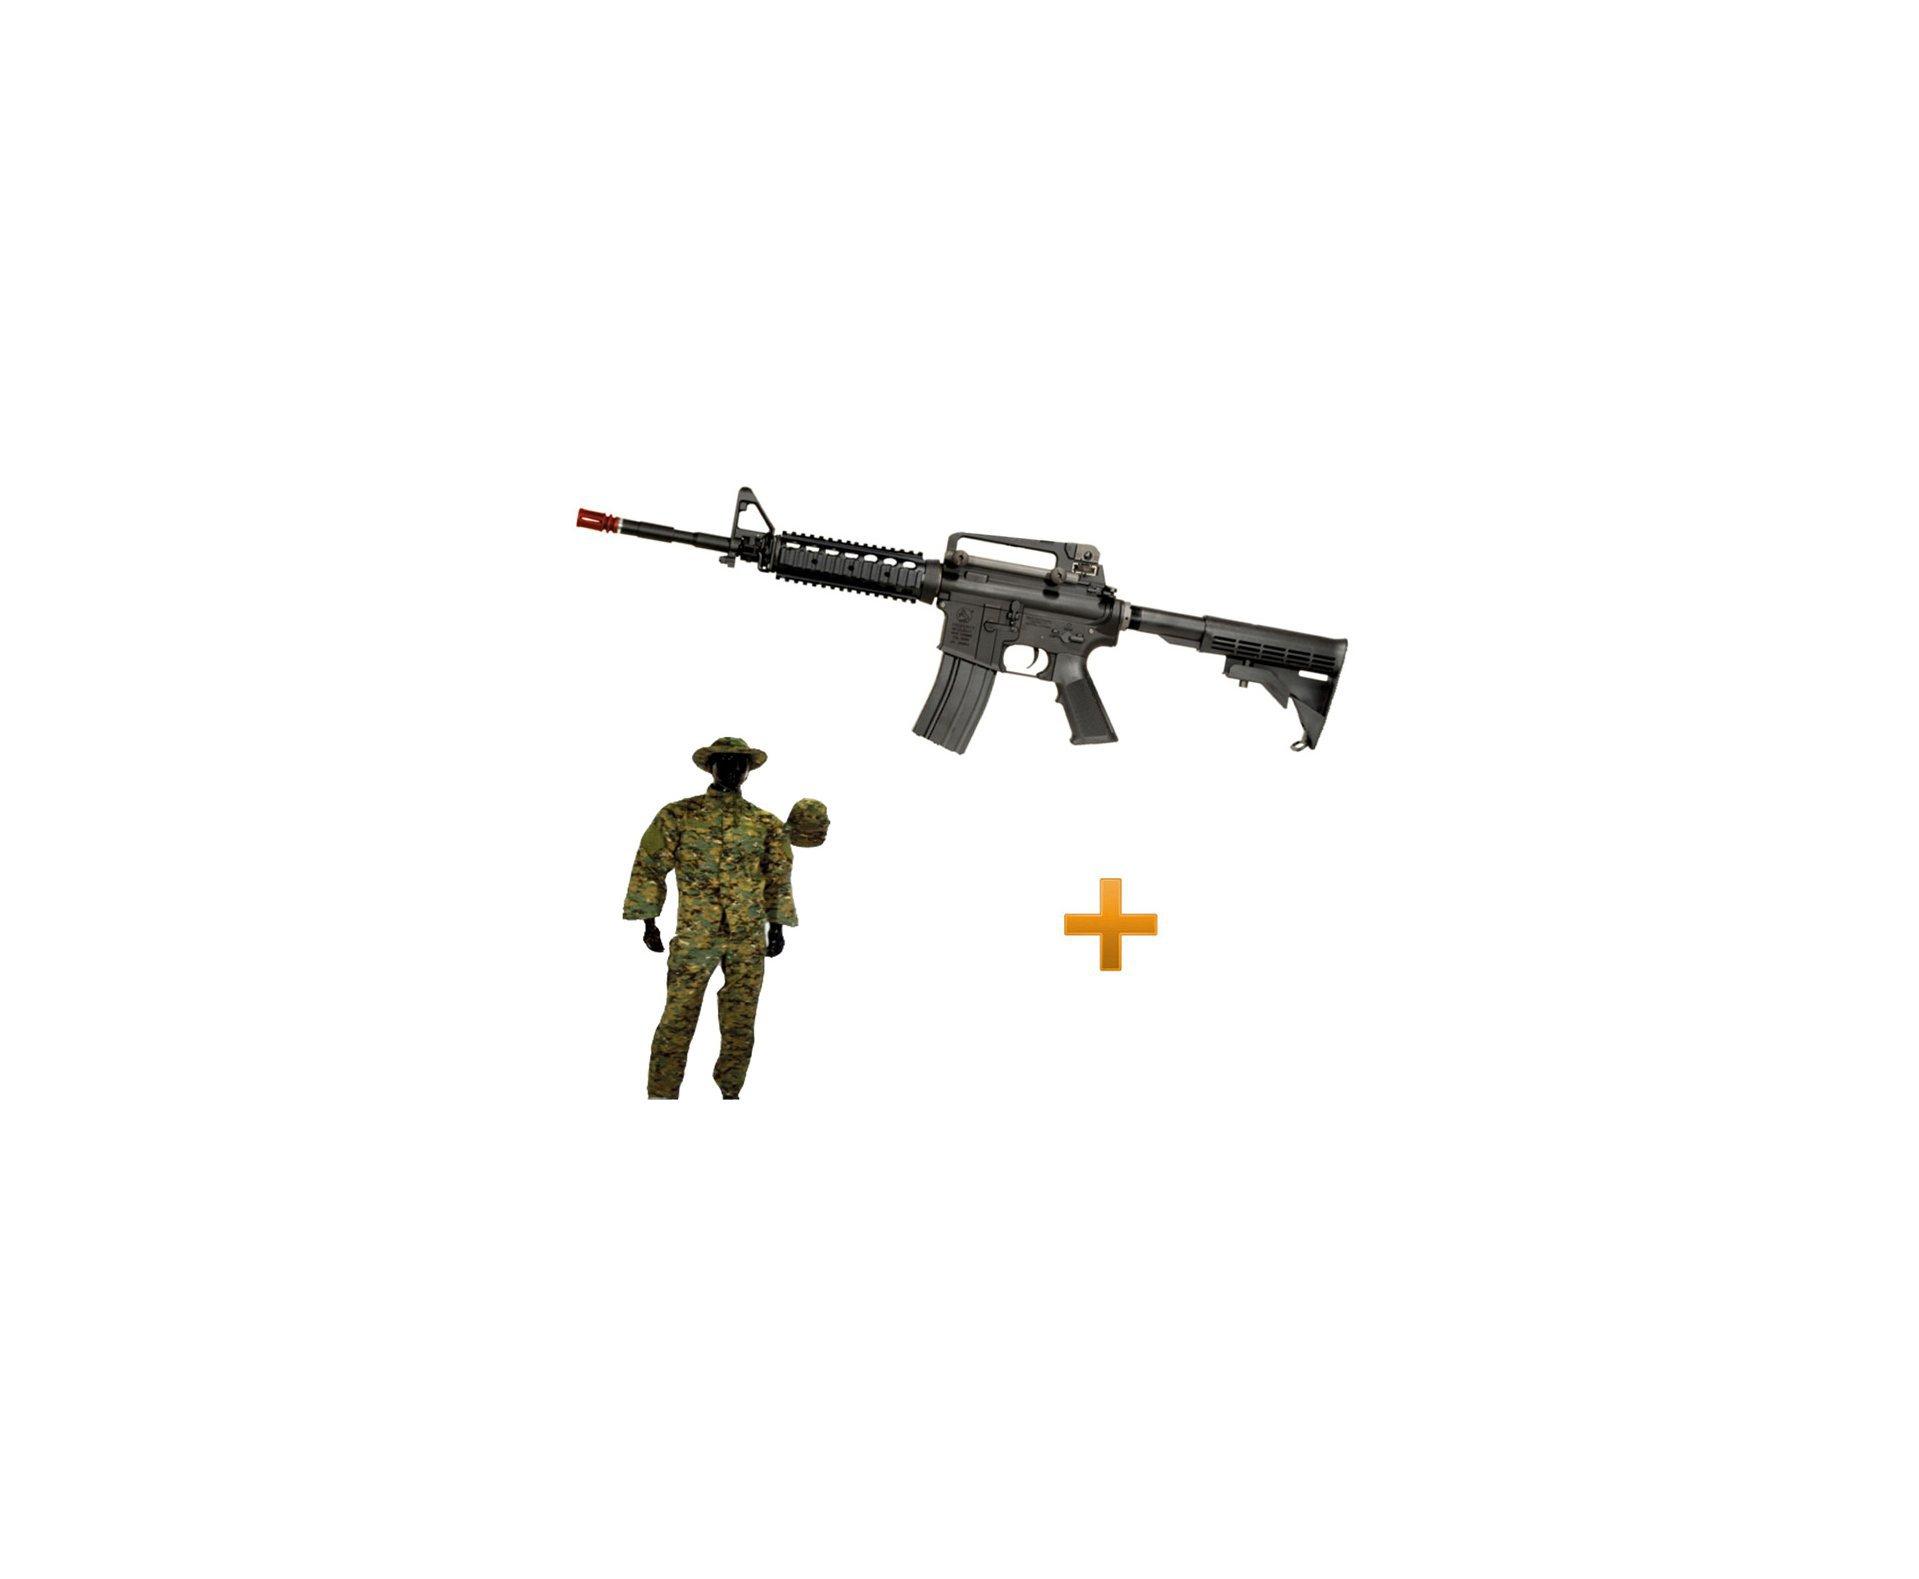 Rifle De Airsoft Colt M4a1ris Cal 6,0 Mm - King Arms + Farda Marpat Digital Selva Swiss+arms - Tamanho G